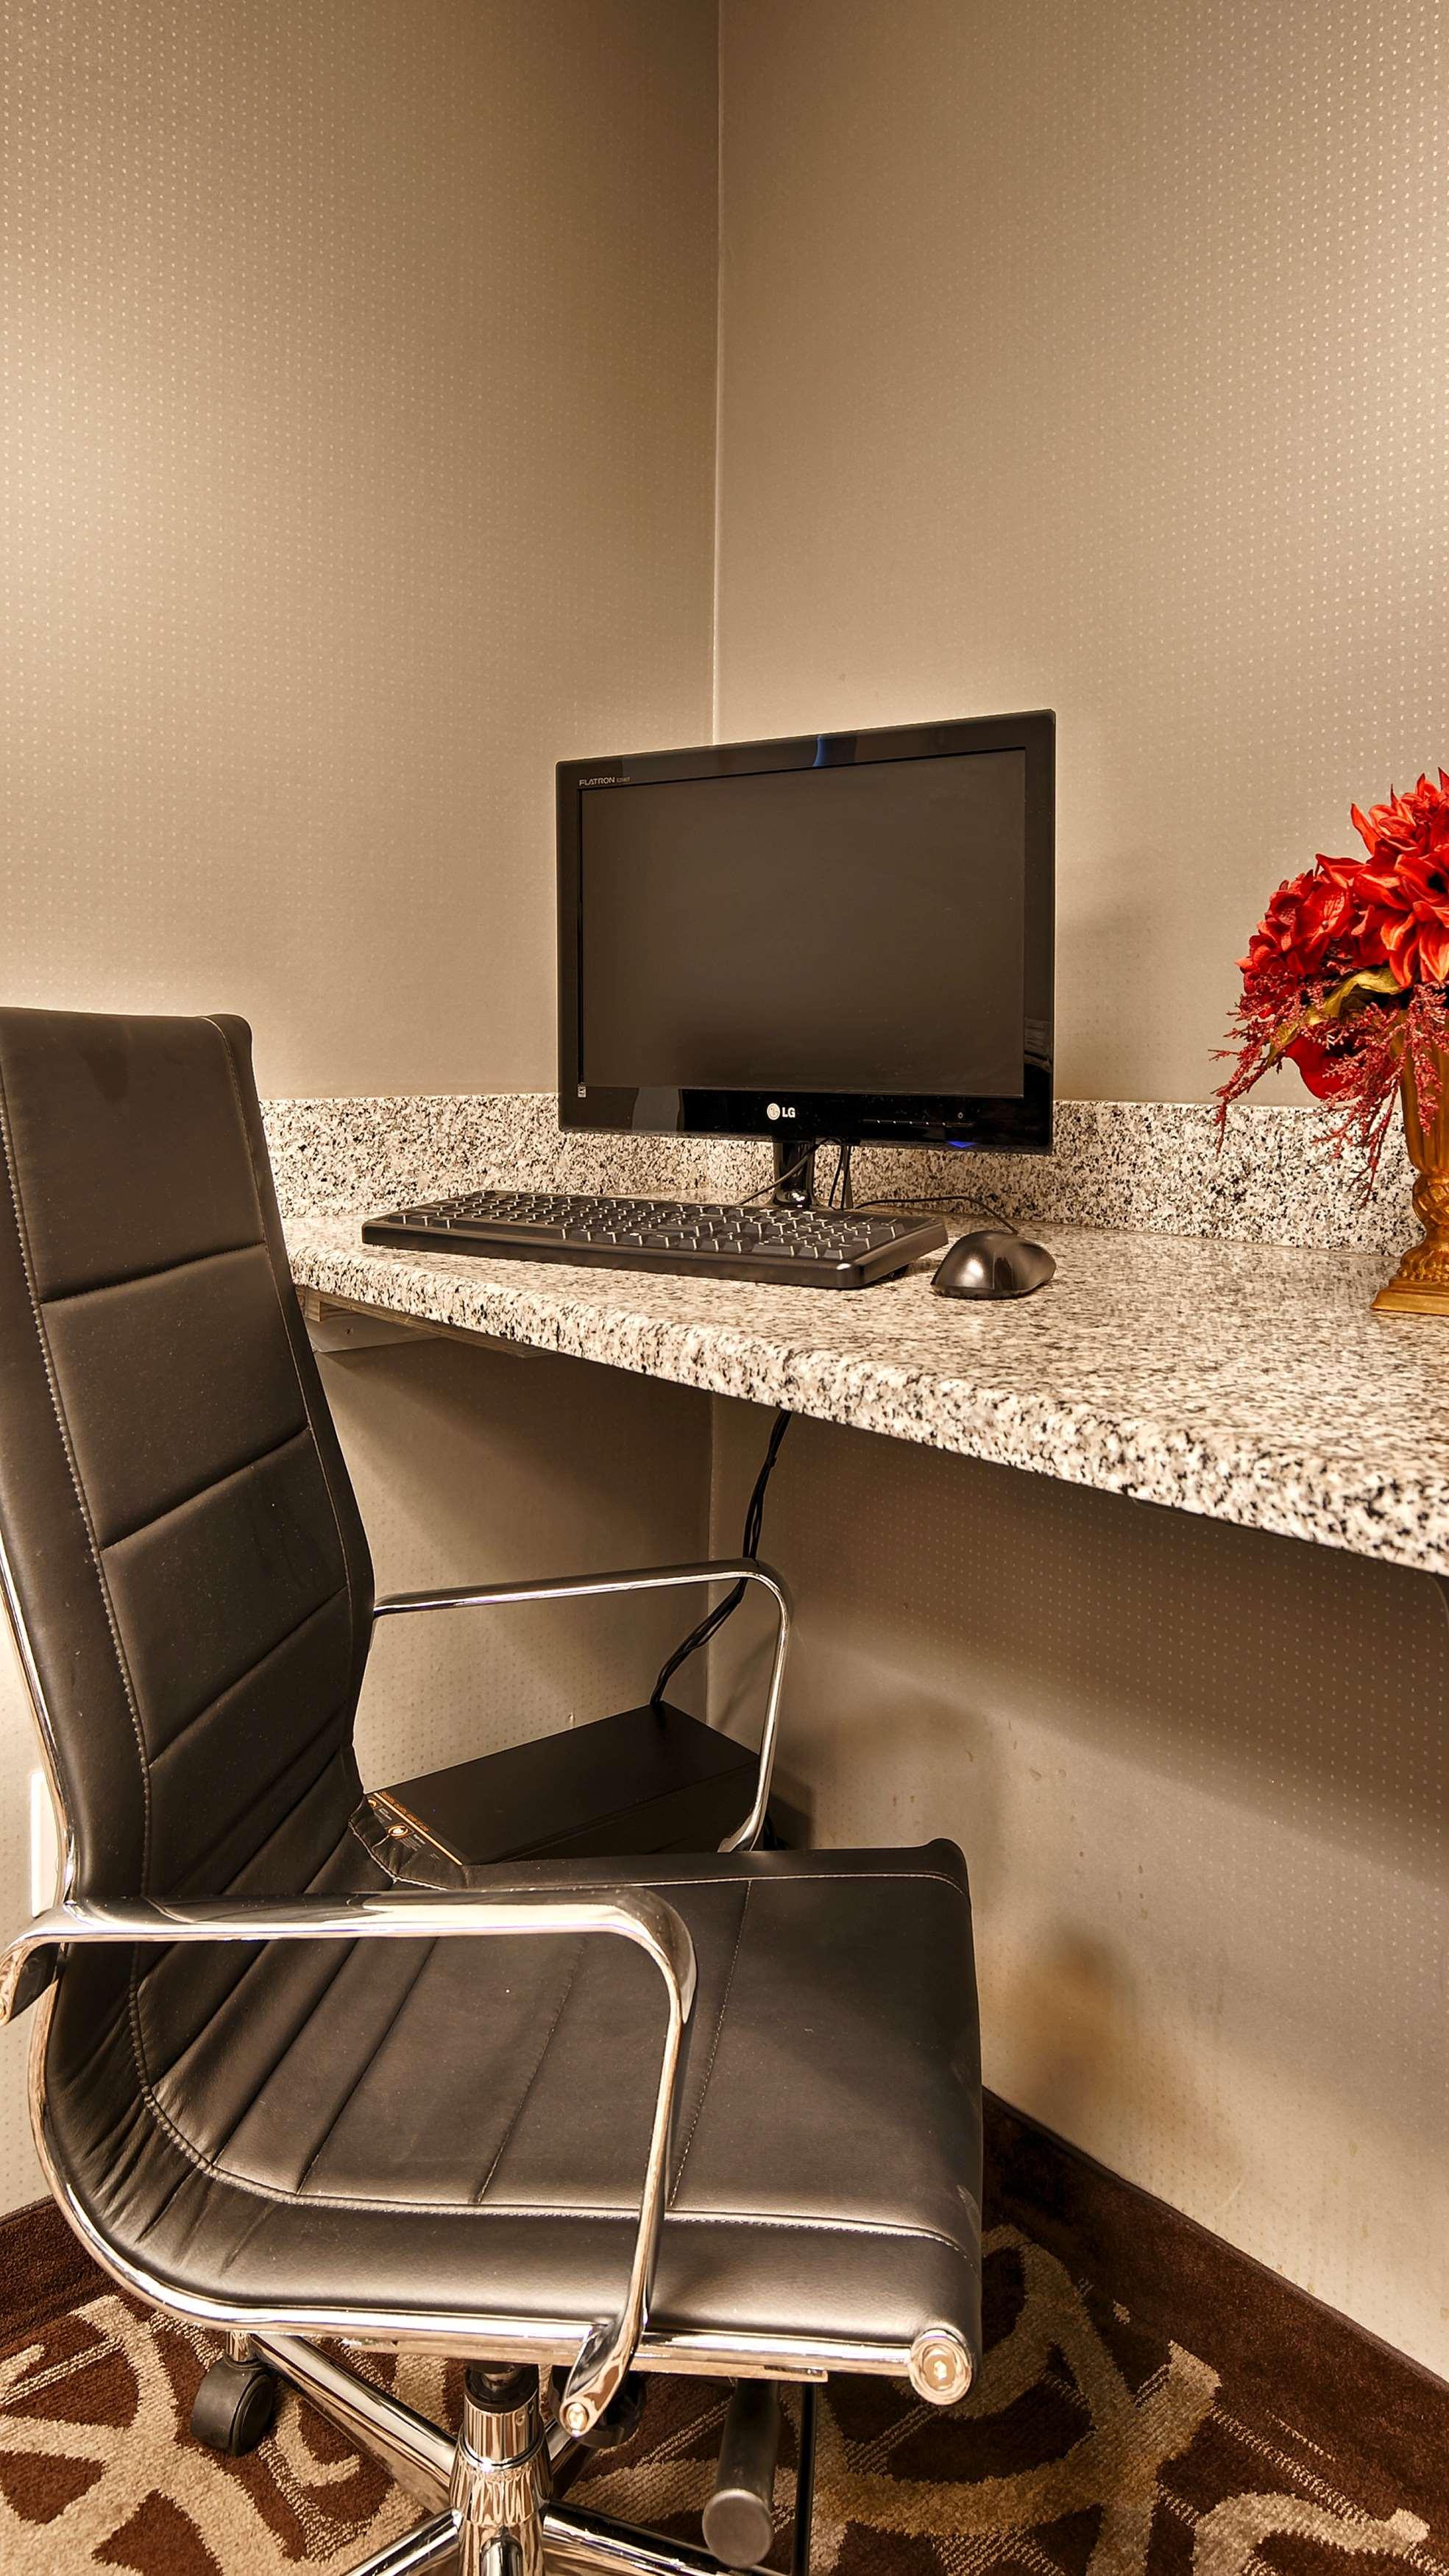 Best Western Plus Austin Airport Inn & Suites image 8